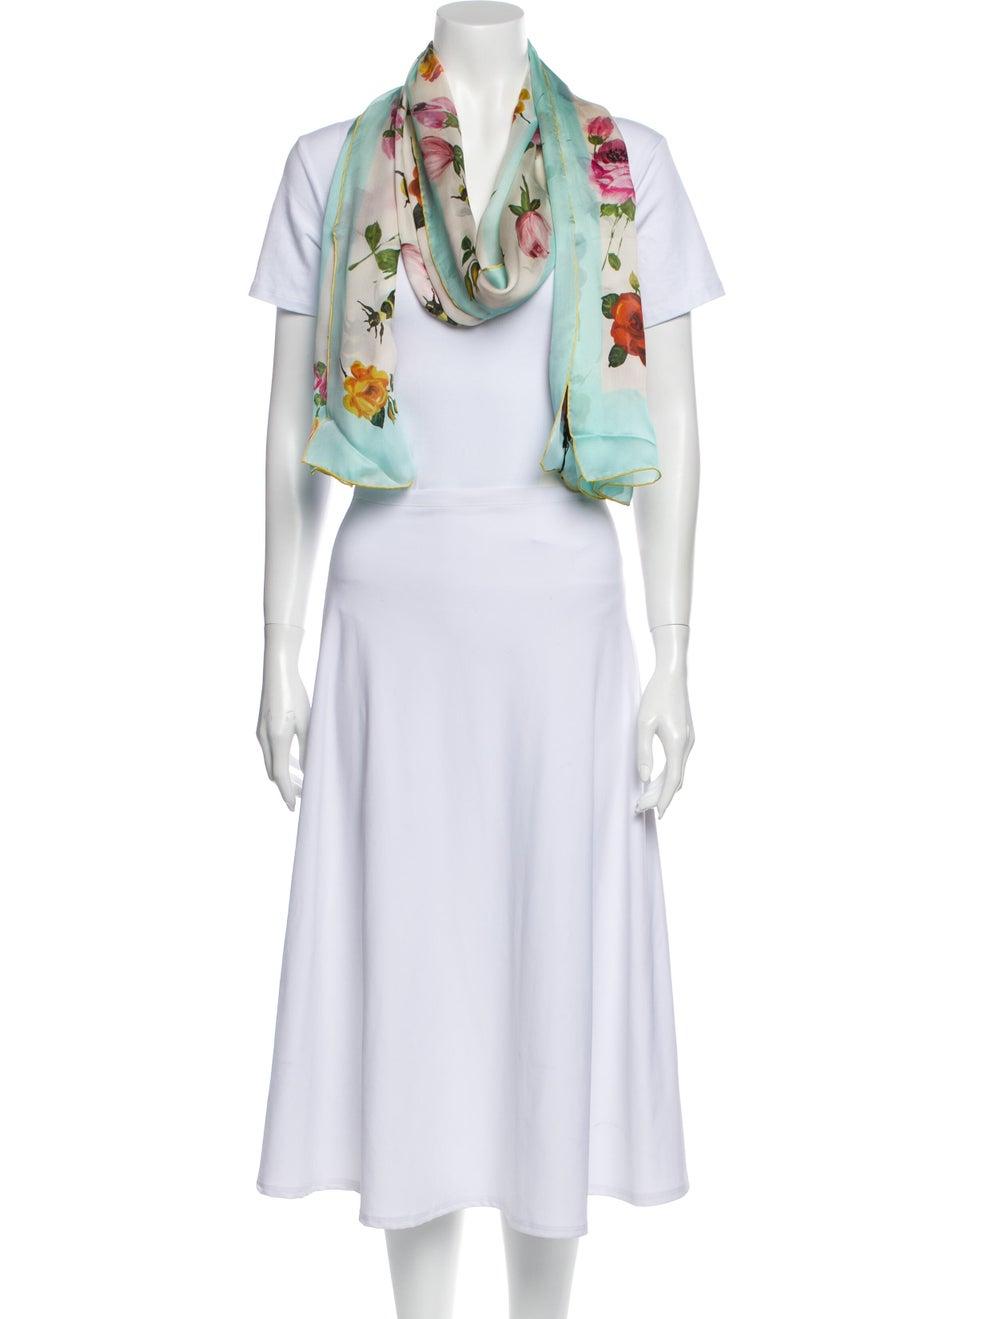 Gucci Silk Floral Print Scarf w/ Tags - image 3